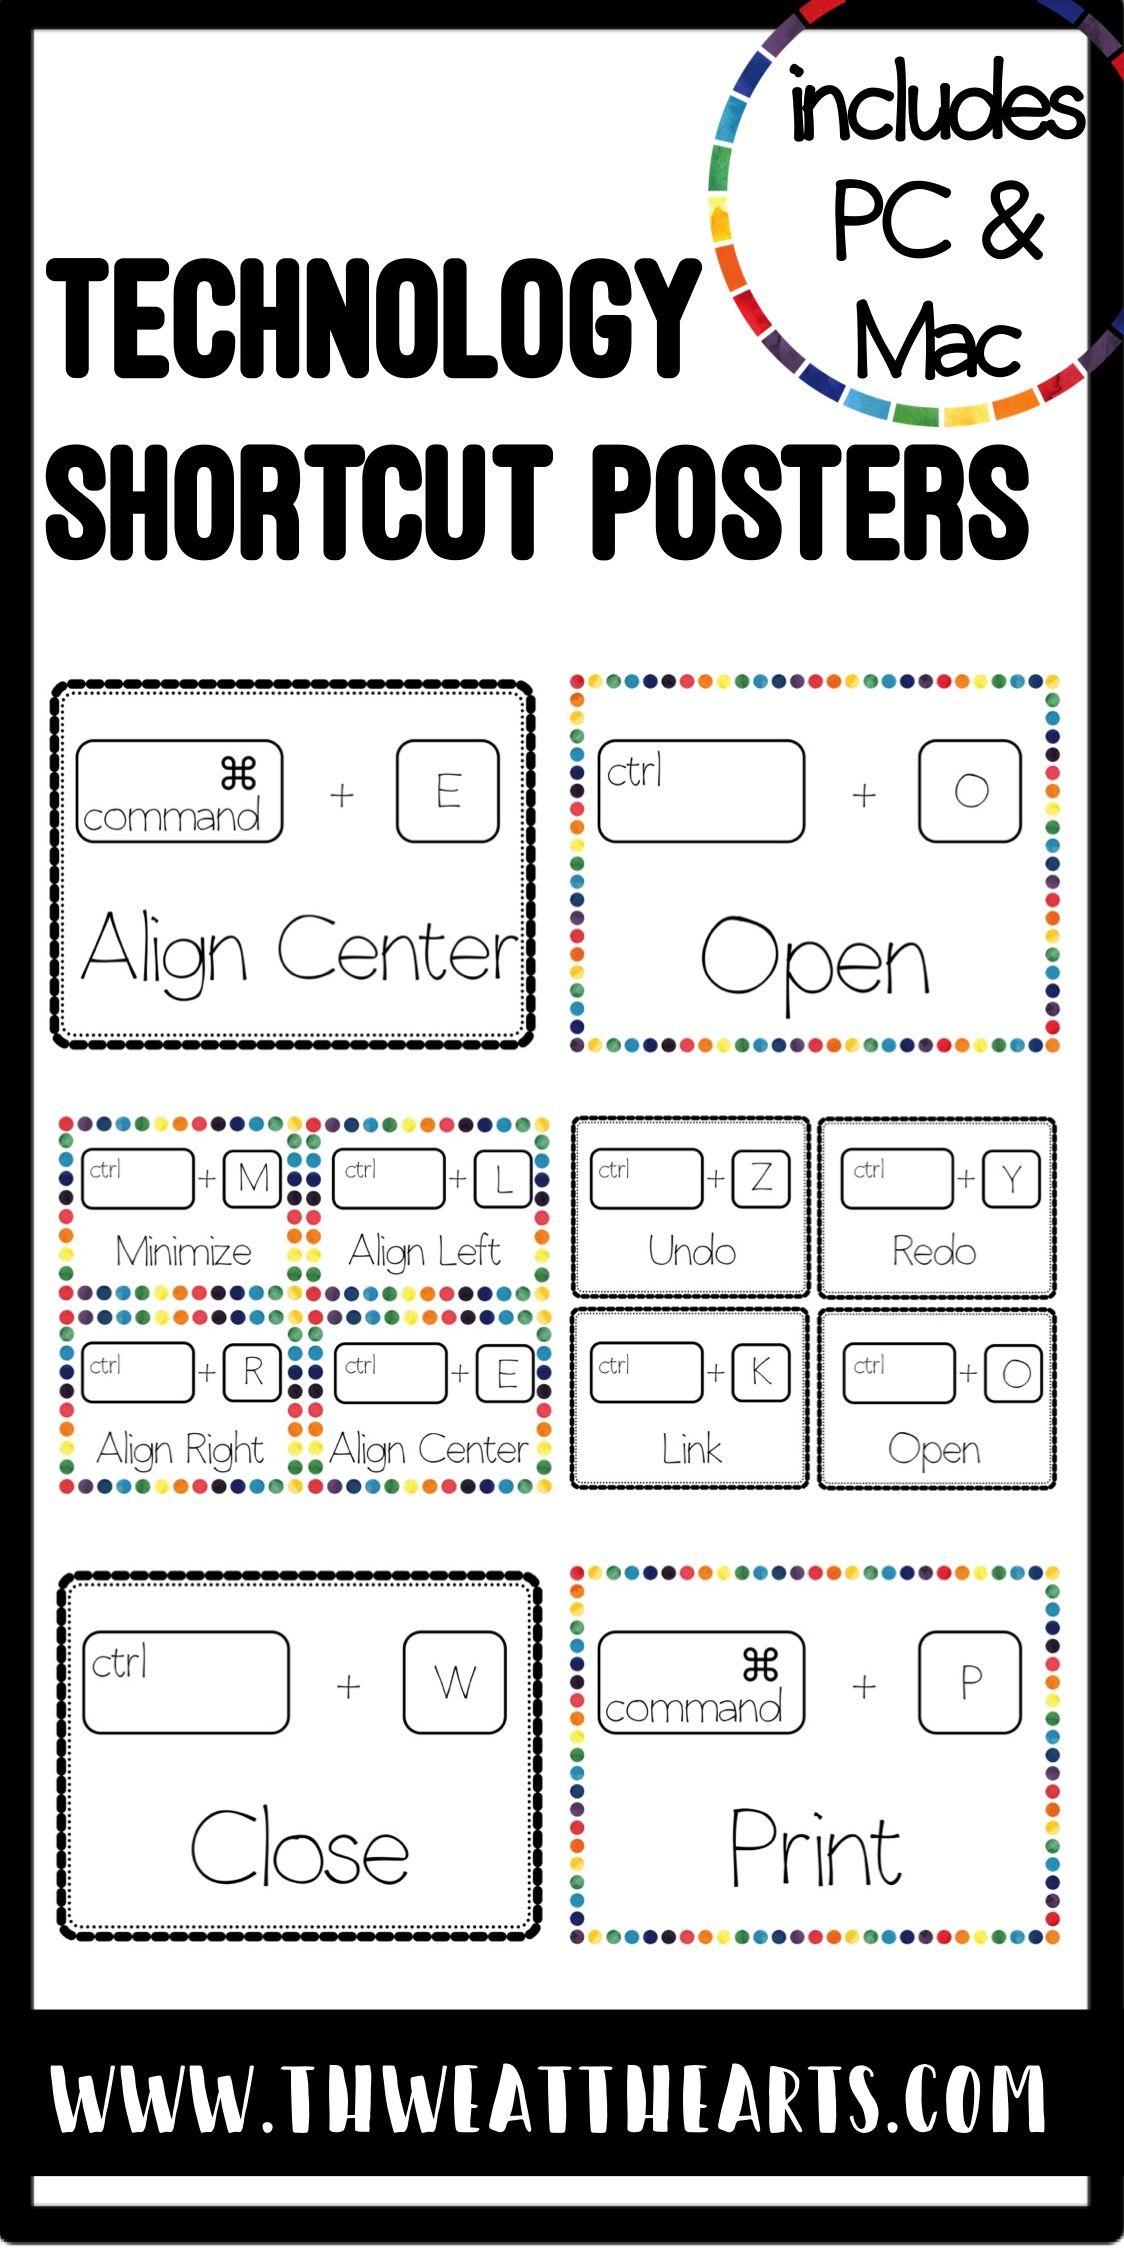 Computer Shortcut Poster Set Including 20 Different